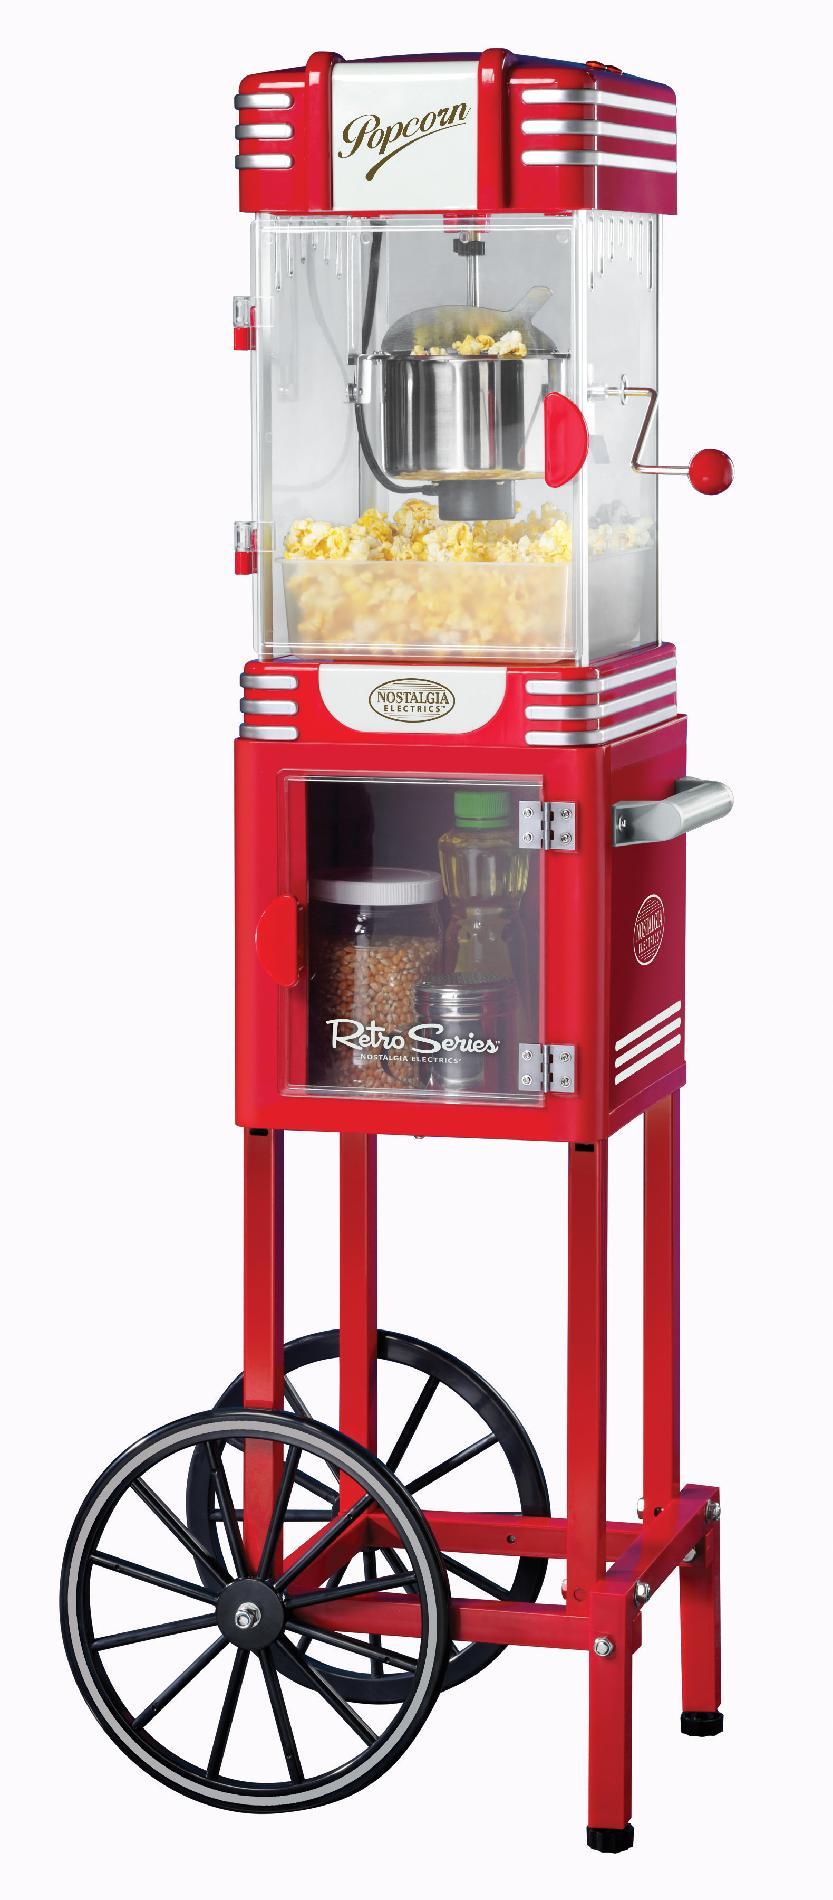 RKP530CART Retro Series Kettle Popcorn Cart